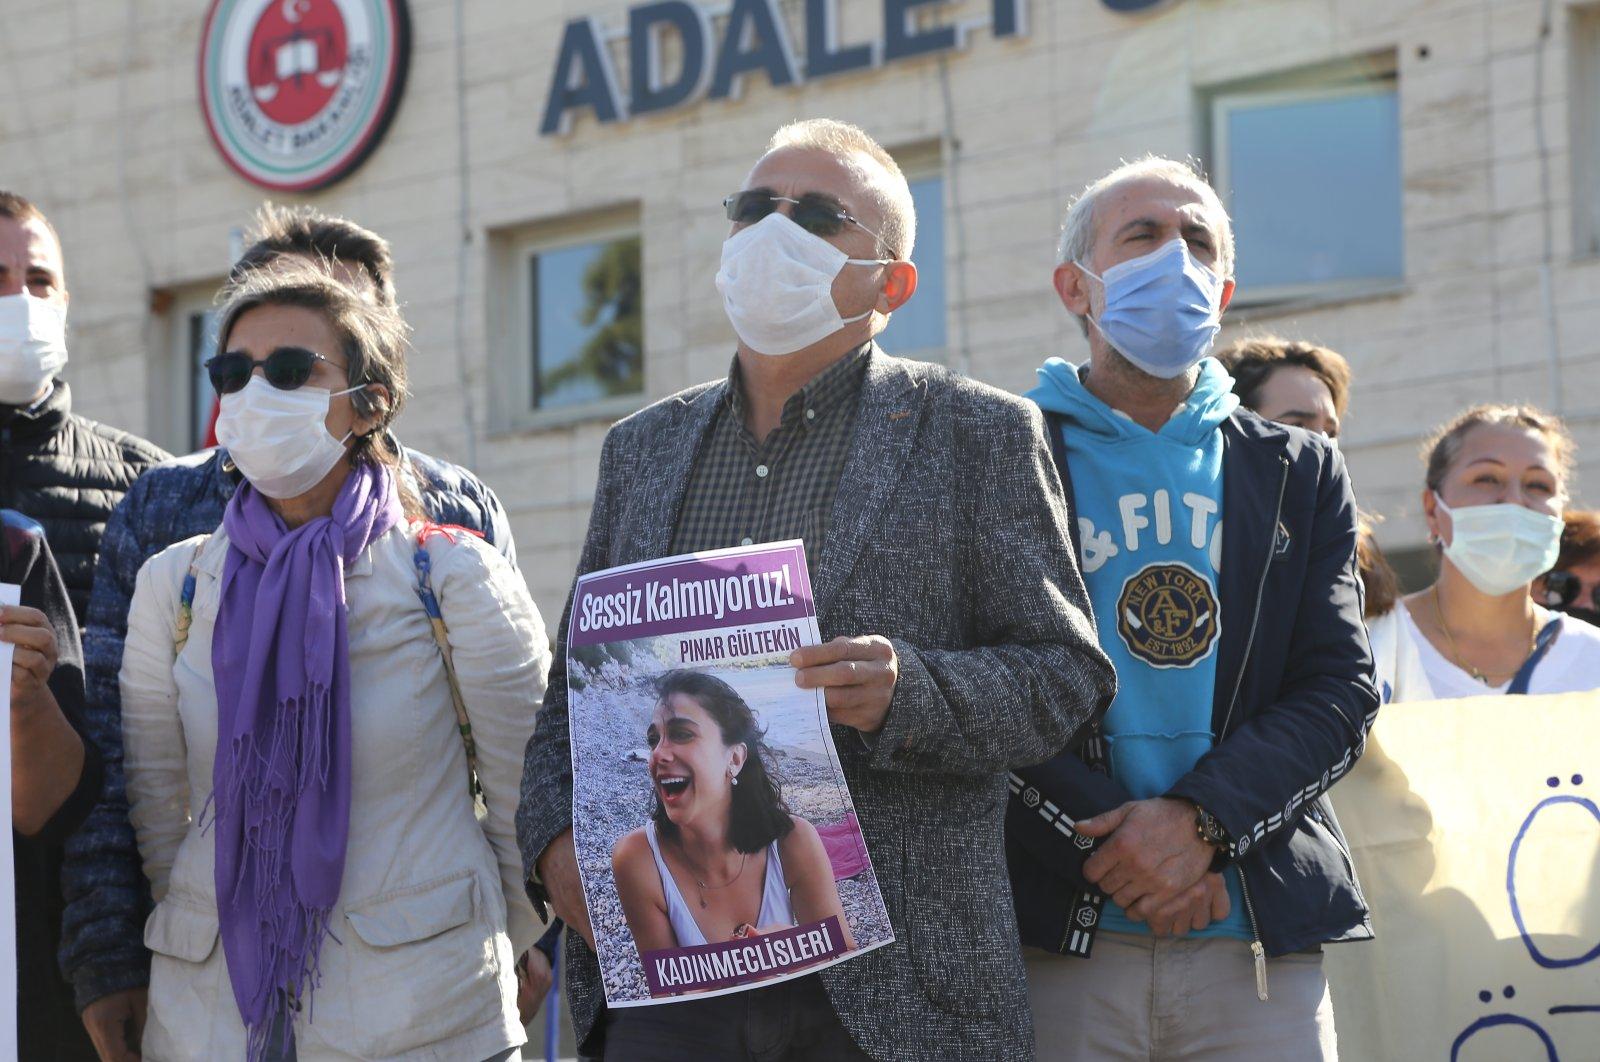 Pınar Gültekin's father Sıddık Gültekin holds her photo outside the courthouse, in Muğla, southwestern Turkey, Nov. 9, 2020. (AA Photo)